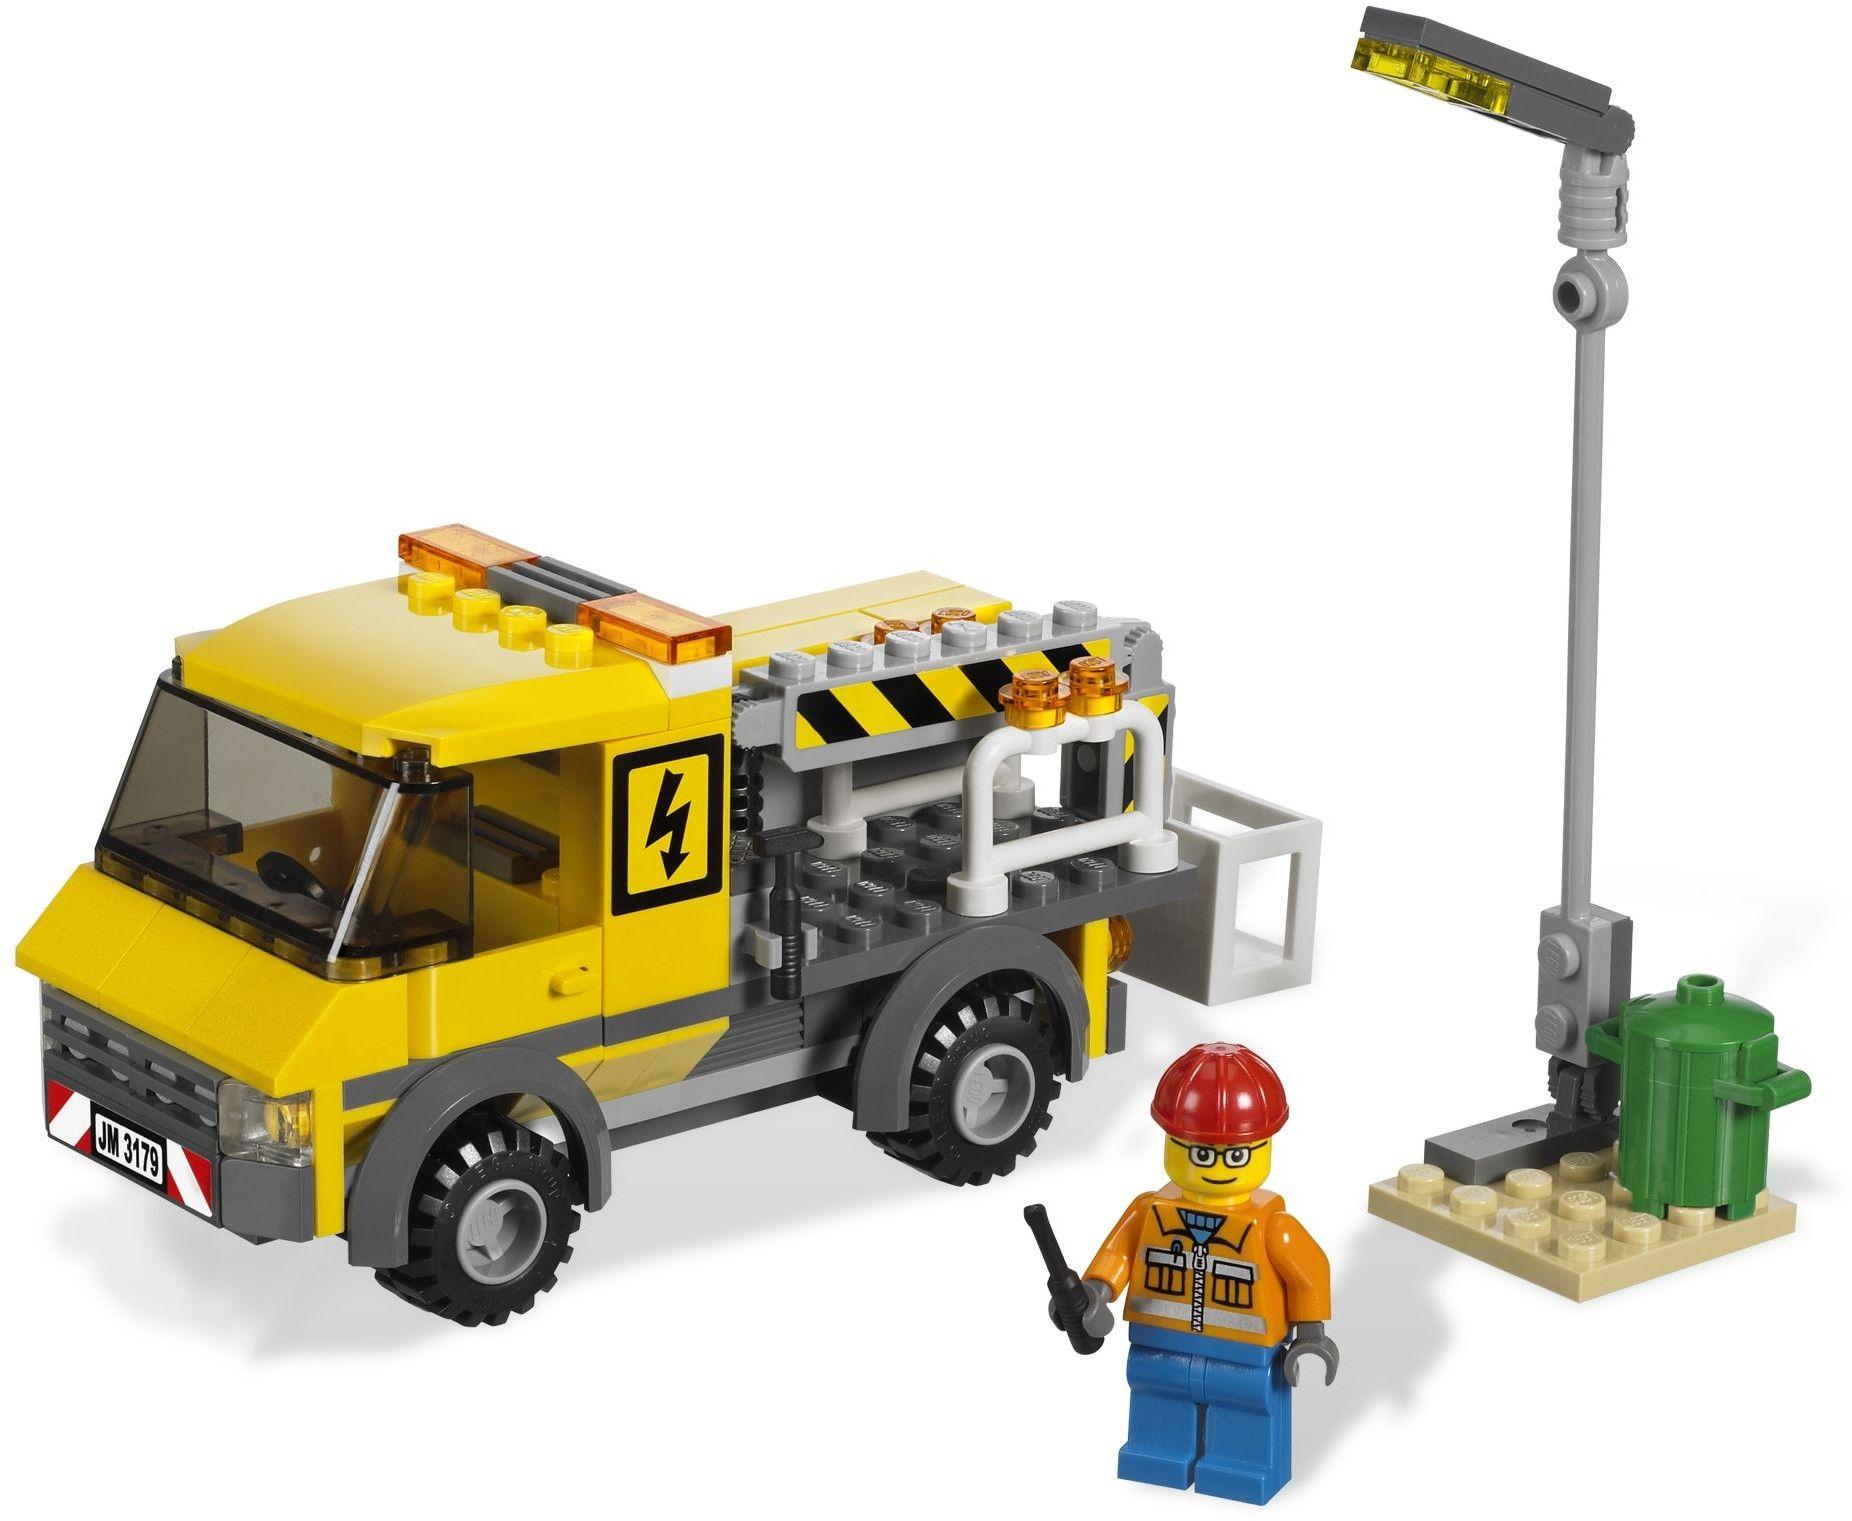 3179 1 Repair Truck Lego City Best Lego Sets Lego City Sets